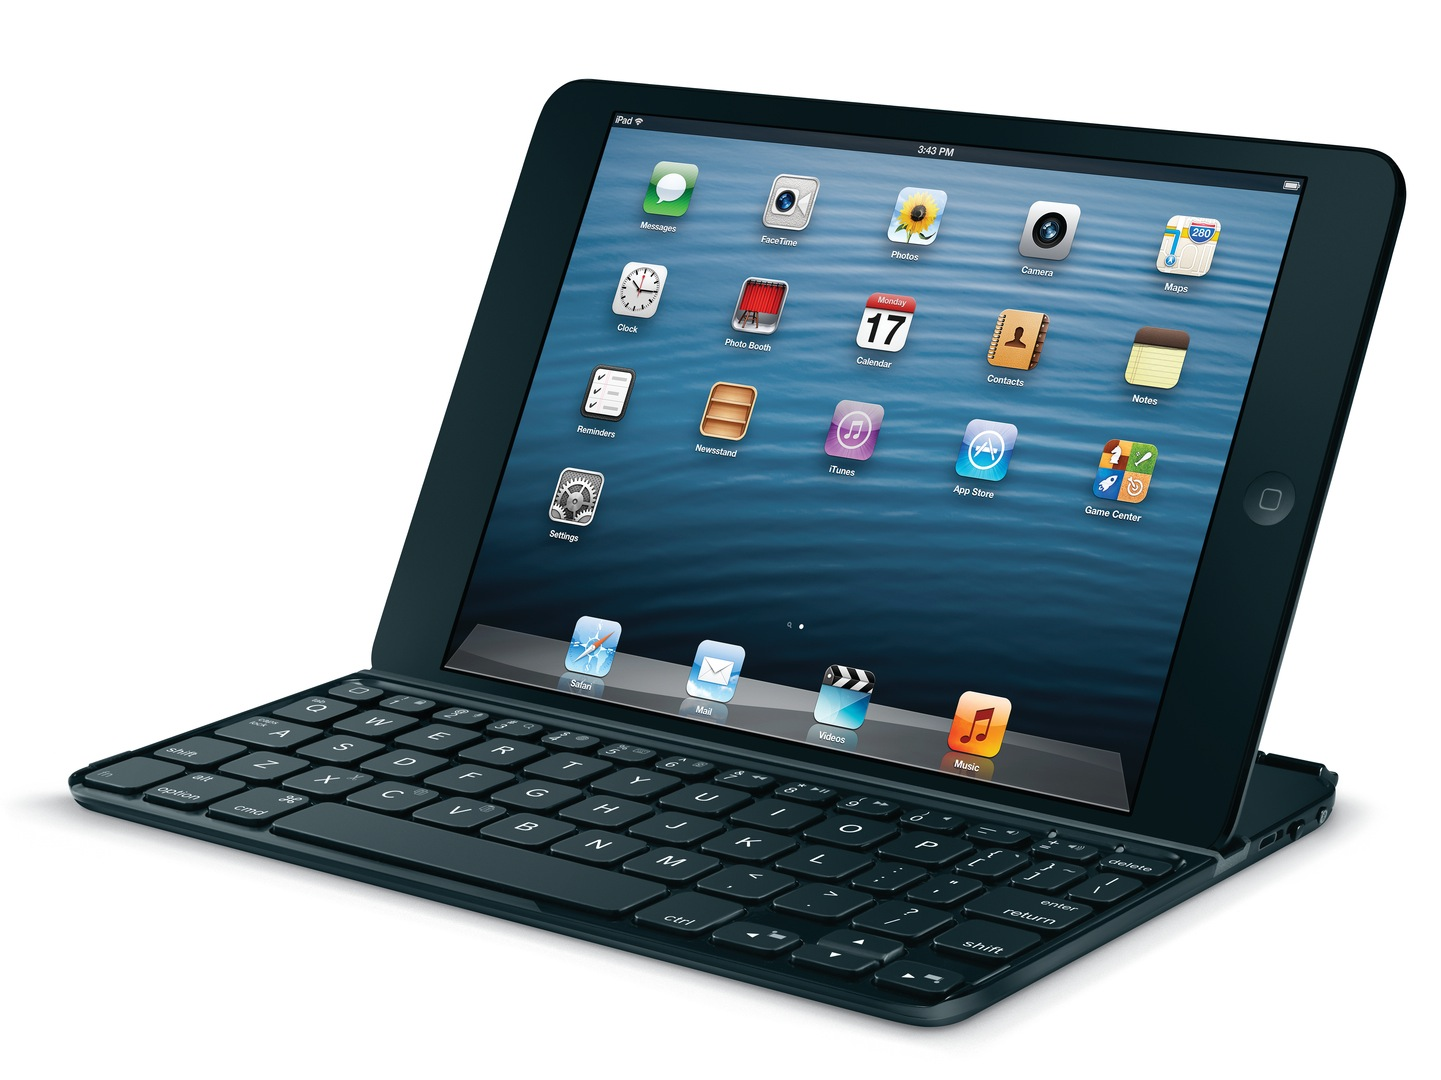 Logitech Ultrathin Keyboard for iPad mini (image 001)